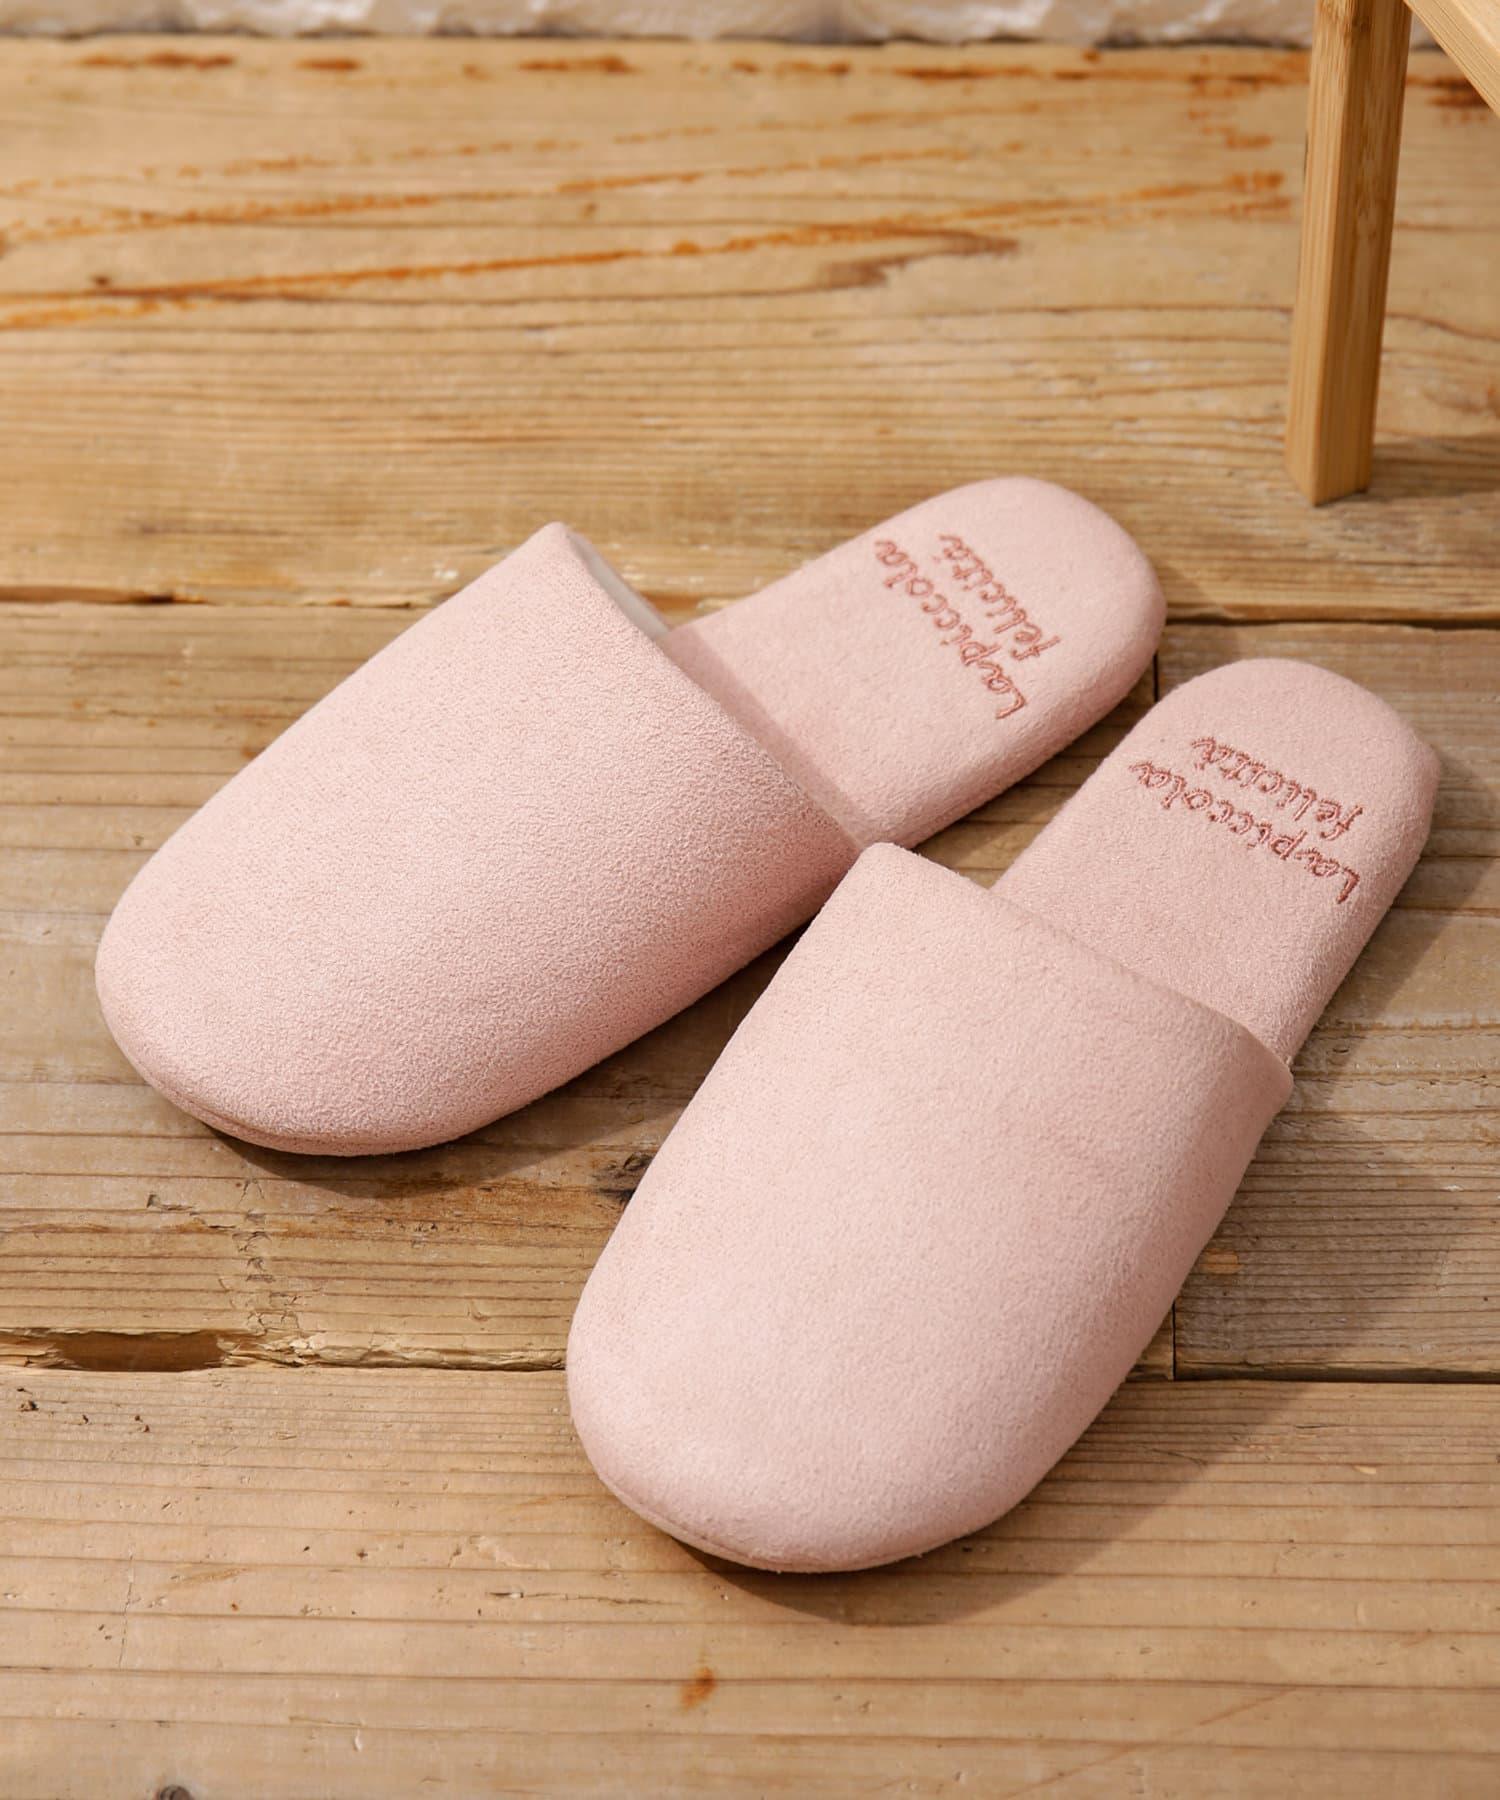 3COINS(スリーコインズ) ライフスタイル 【素材で季節を取り入れよう】洗えるスエード調スリッパ ピンク